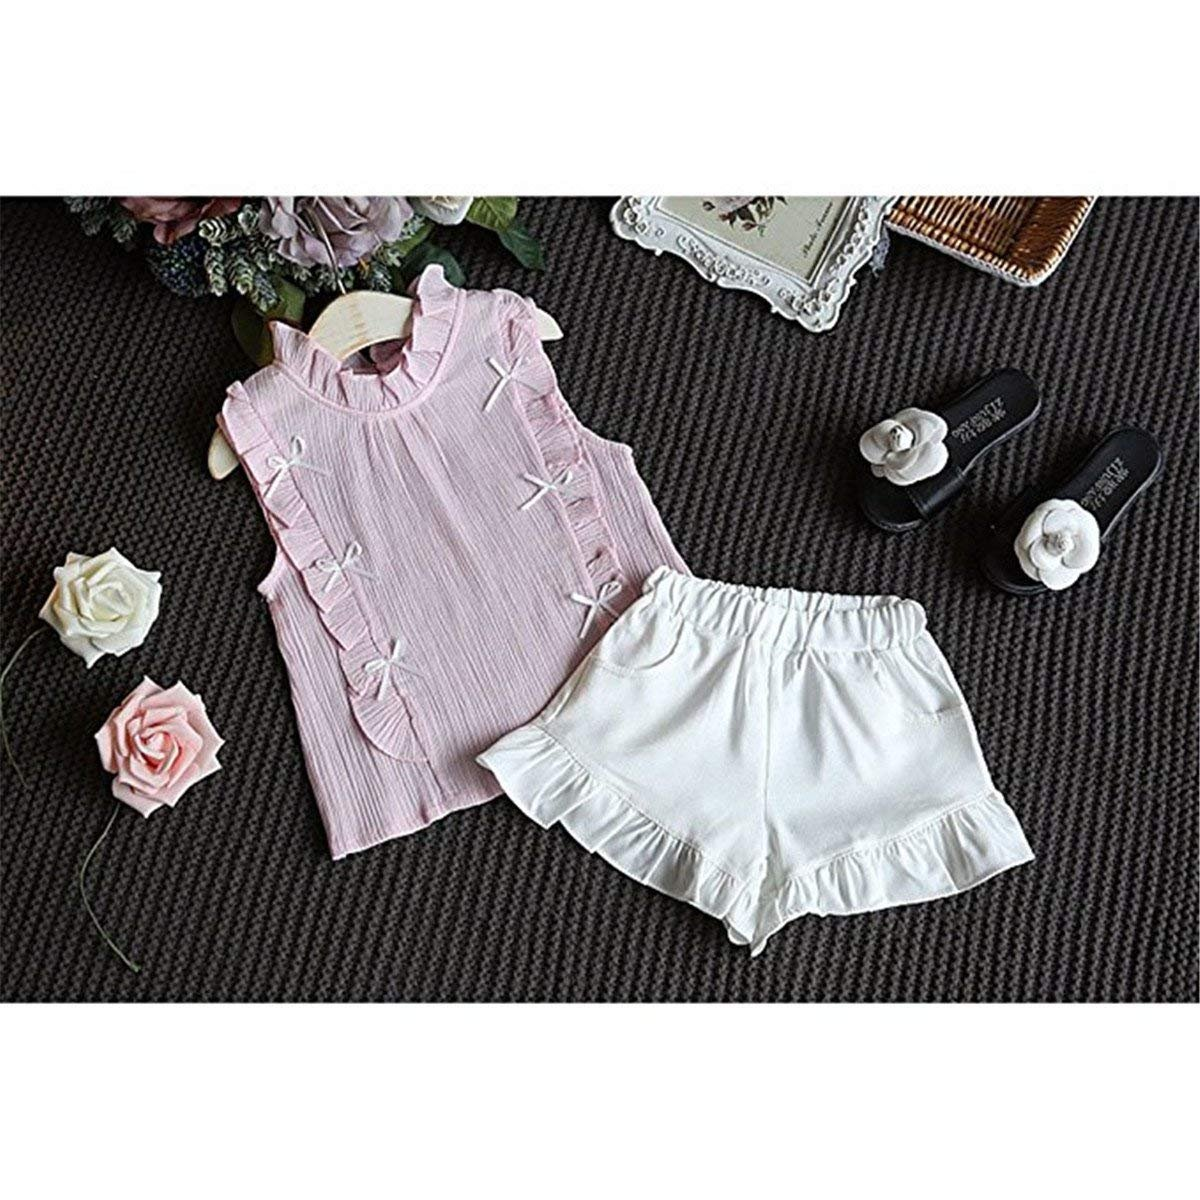 Maylife 2 Pcs Baby Kids Girls Flounce Sleeveless Blouse Shorts Summer Beach Outfits Set